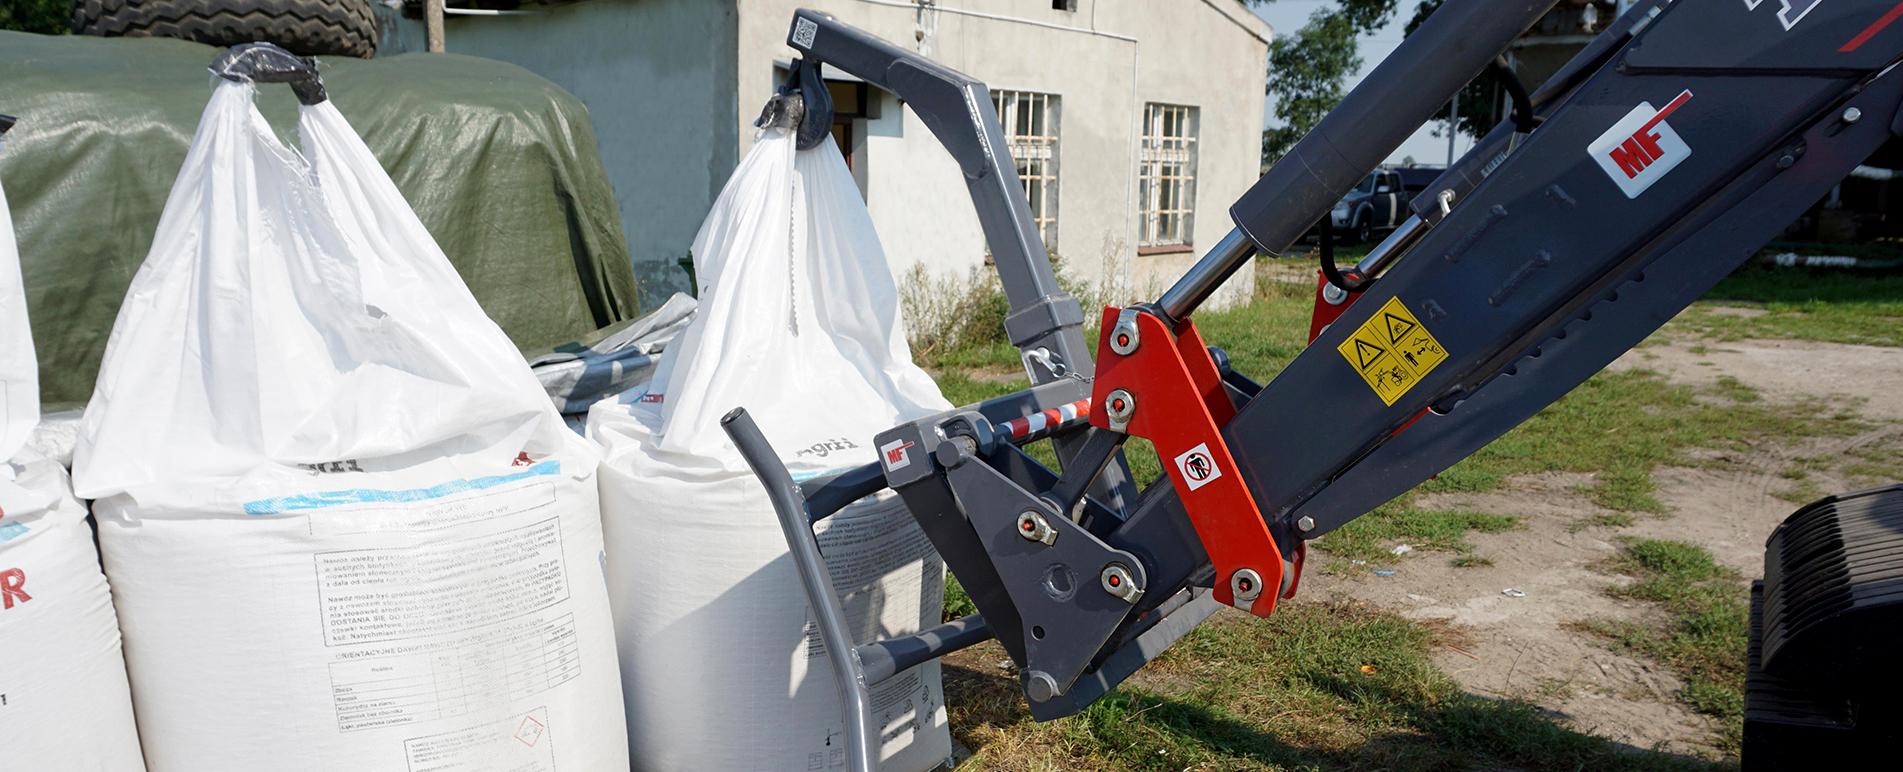 podnosnik-workow-nawozow-big-bag_section2